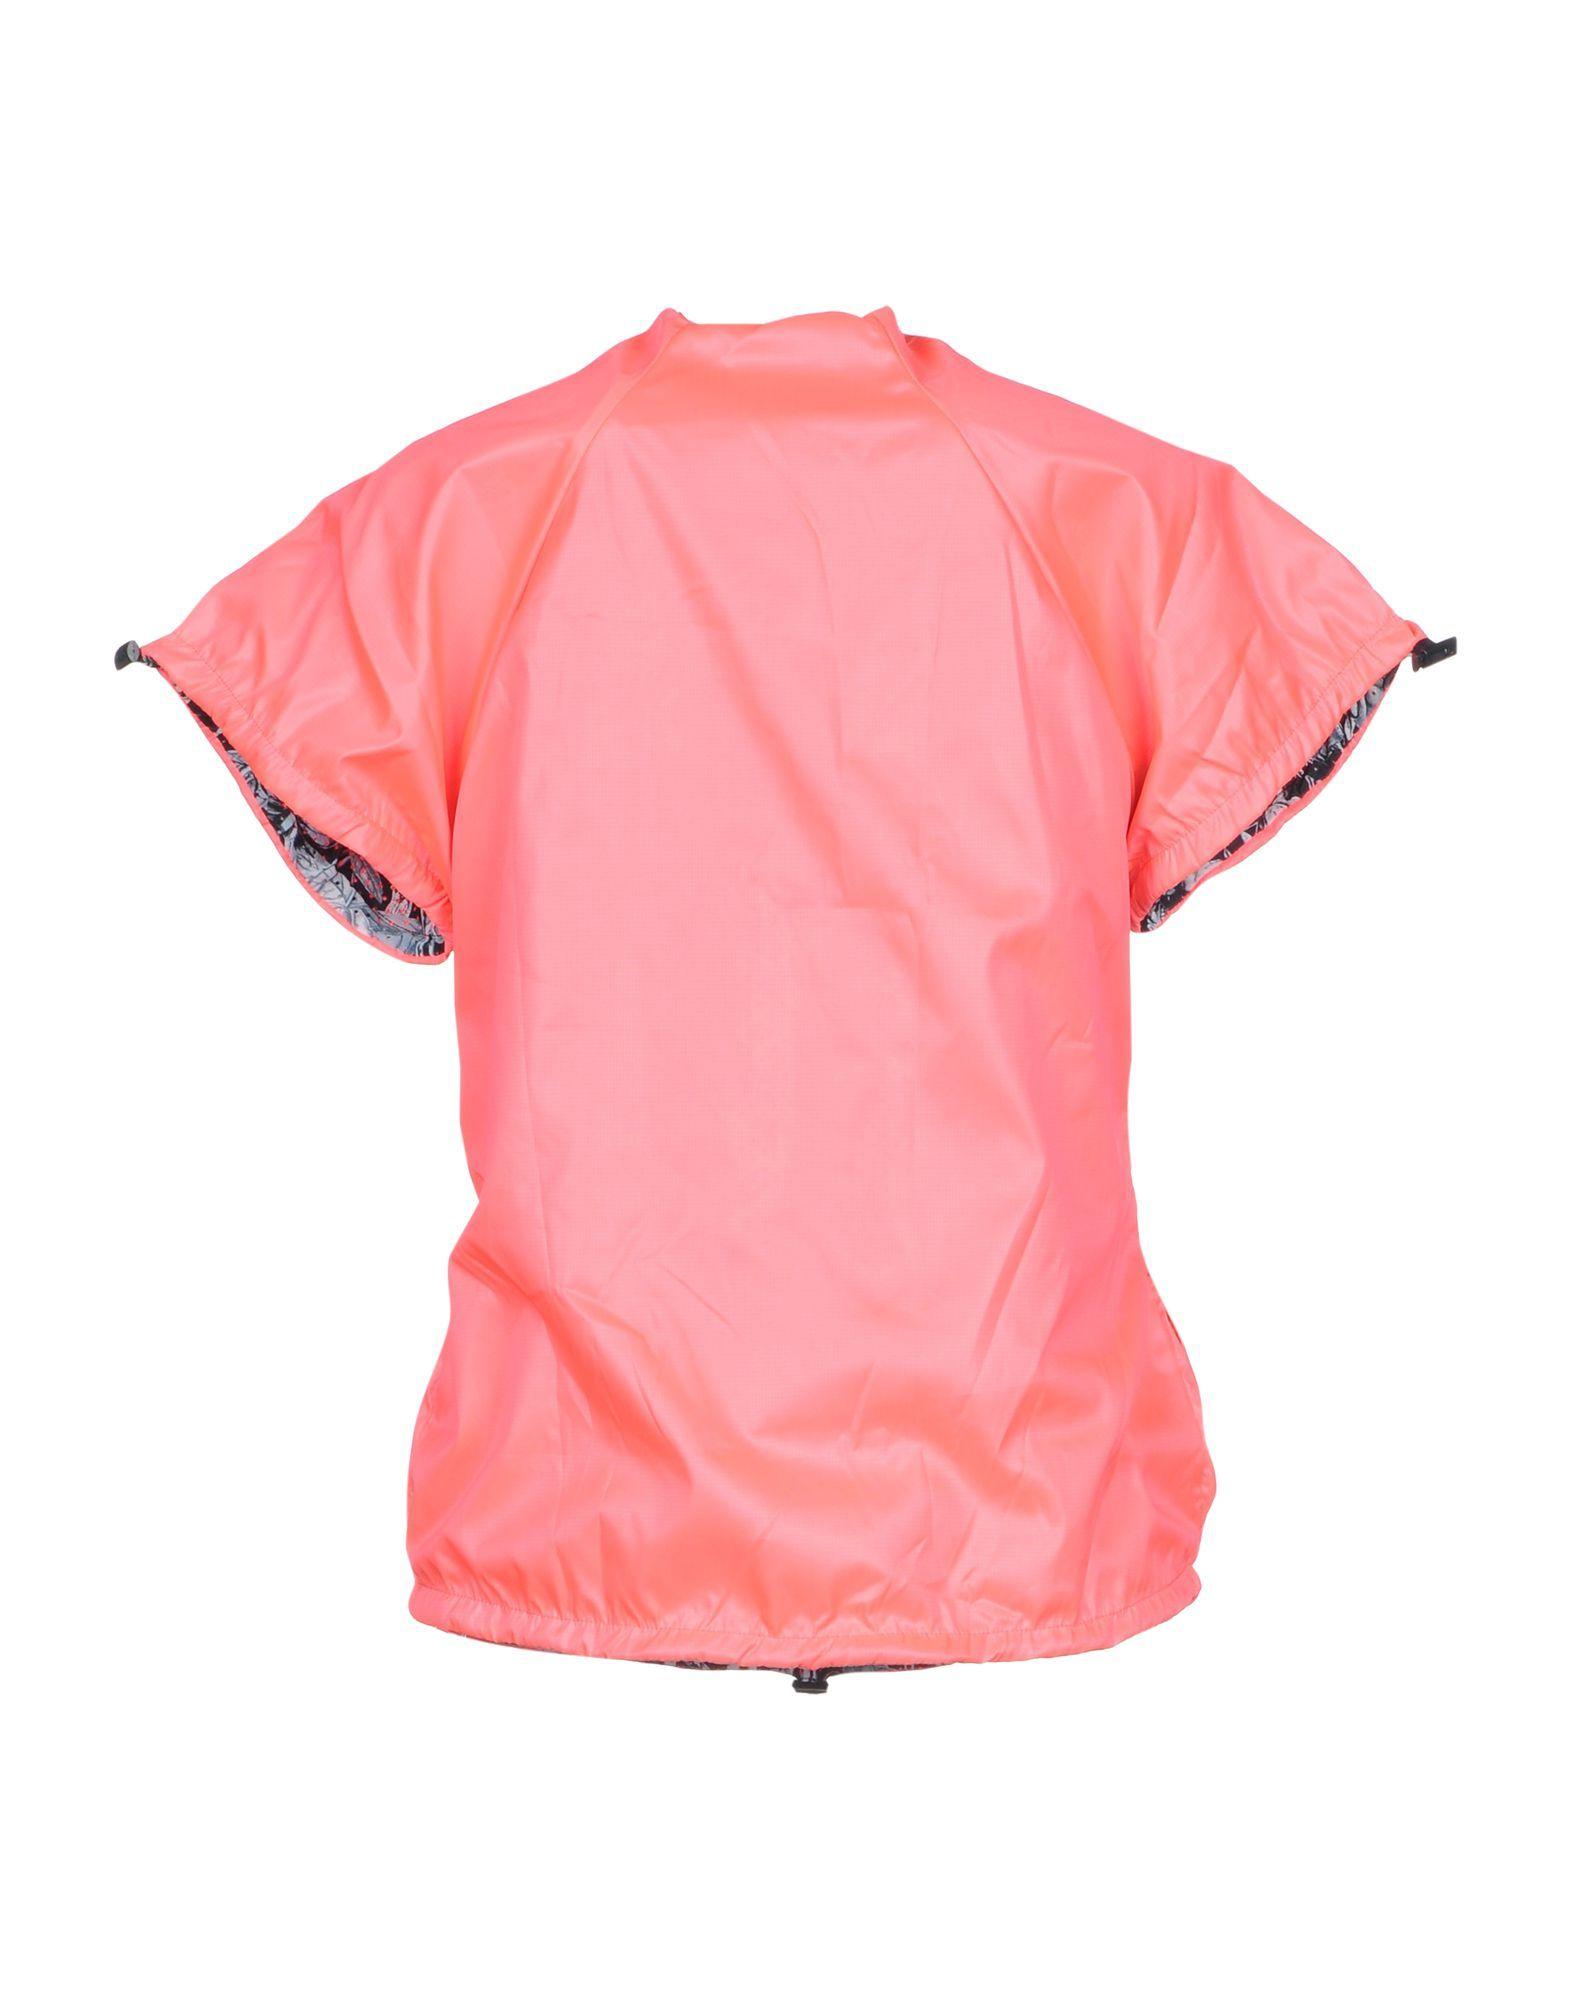 COATS & JACKETS Maaji Coral Woman Polyester